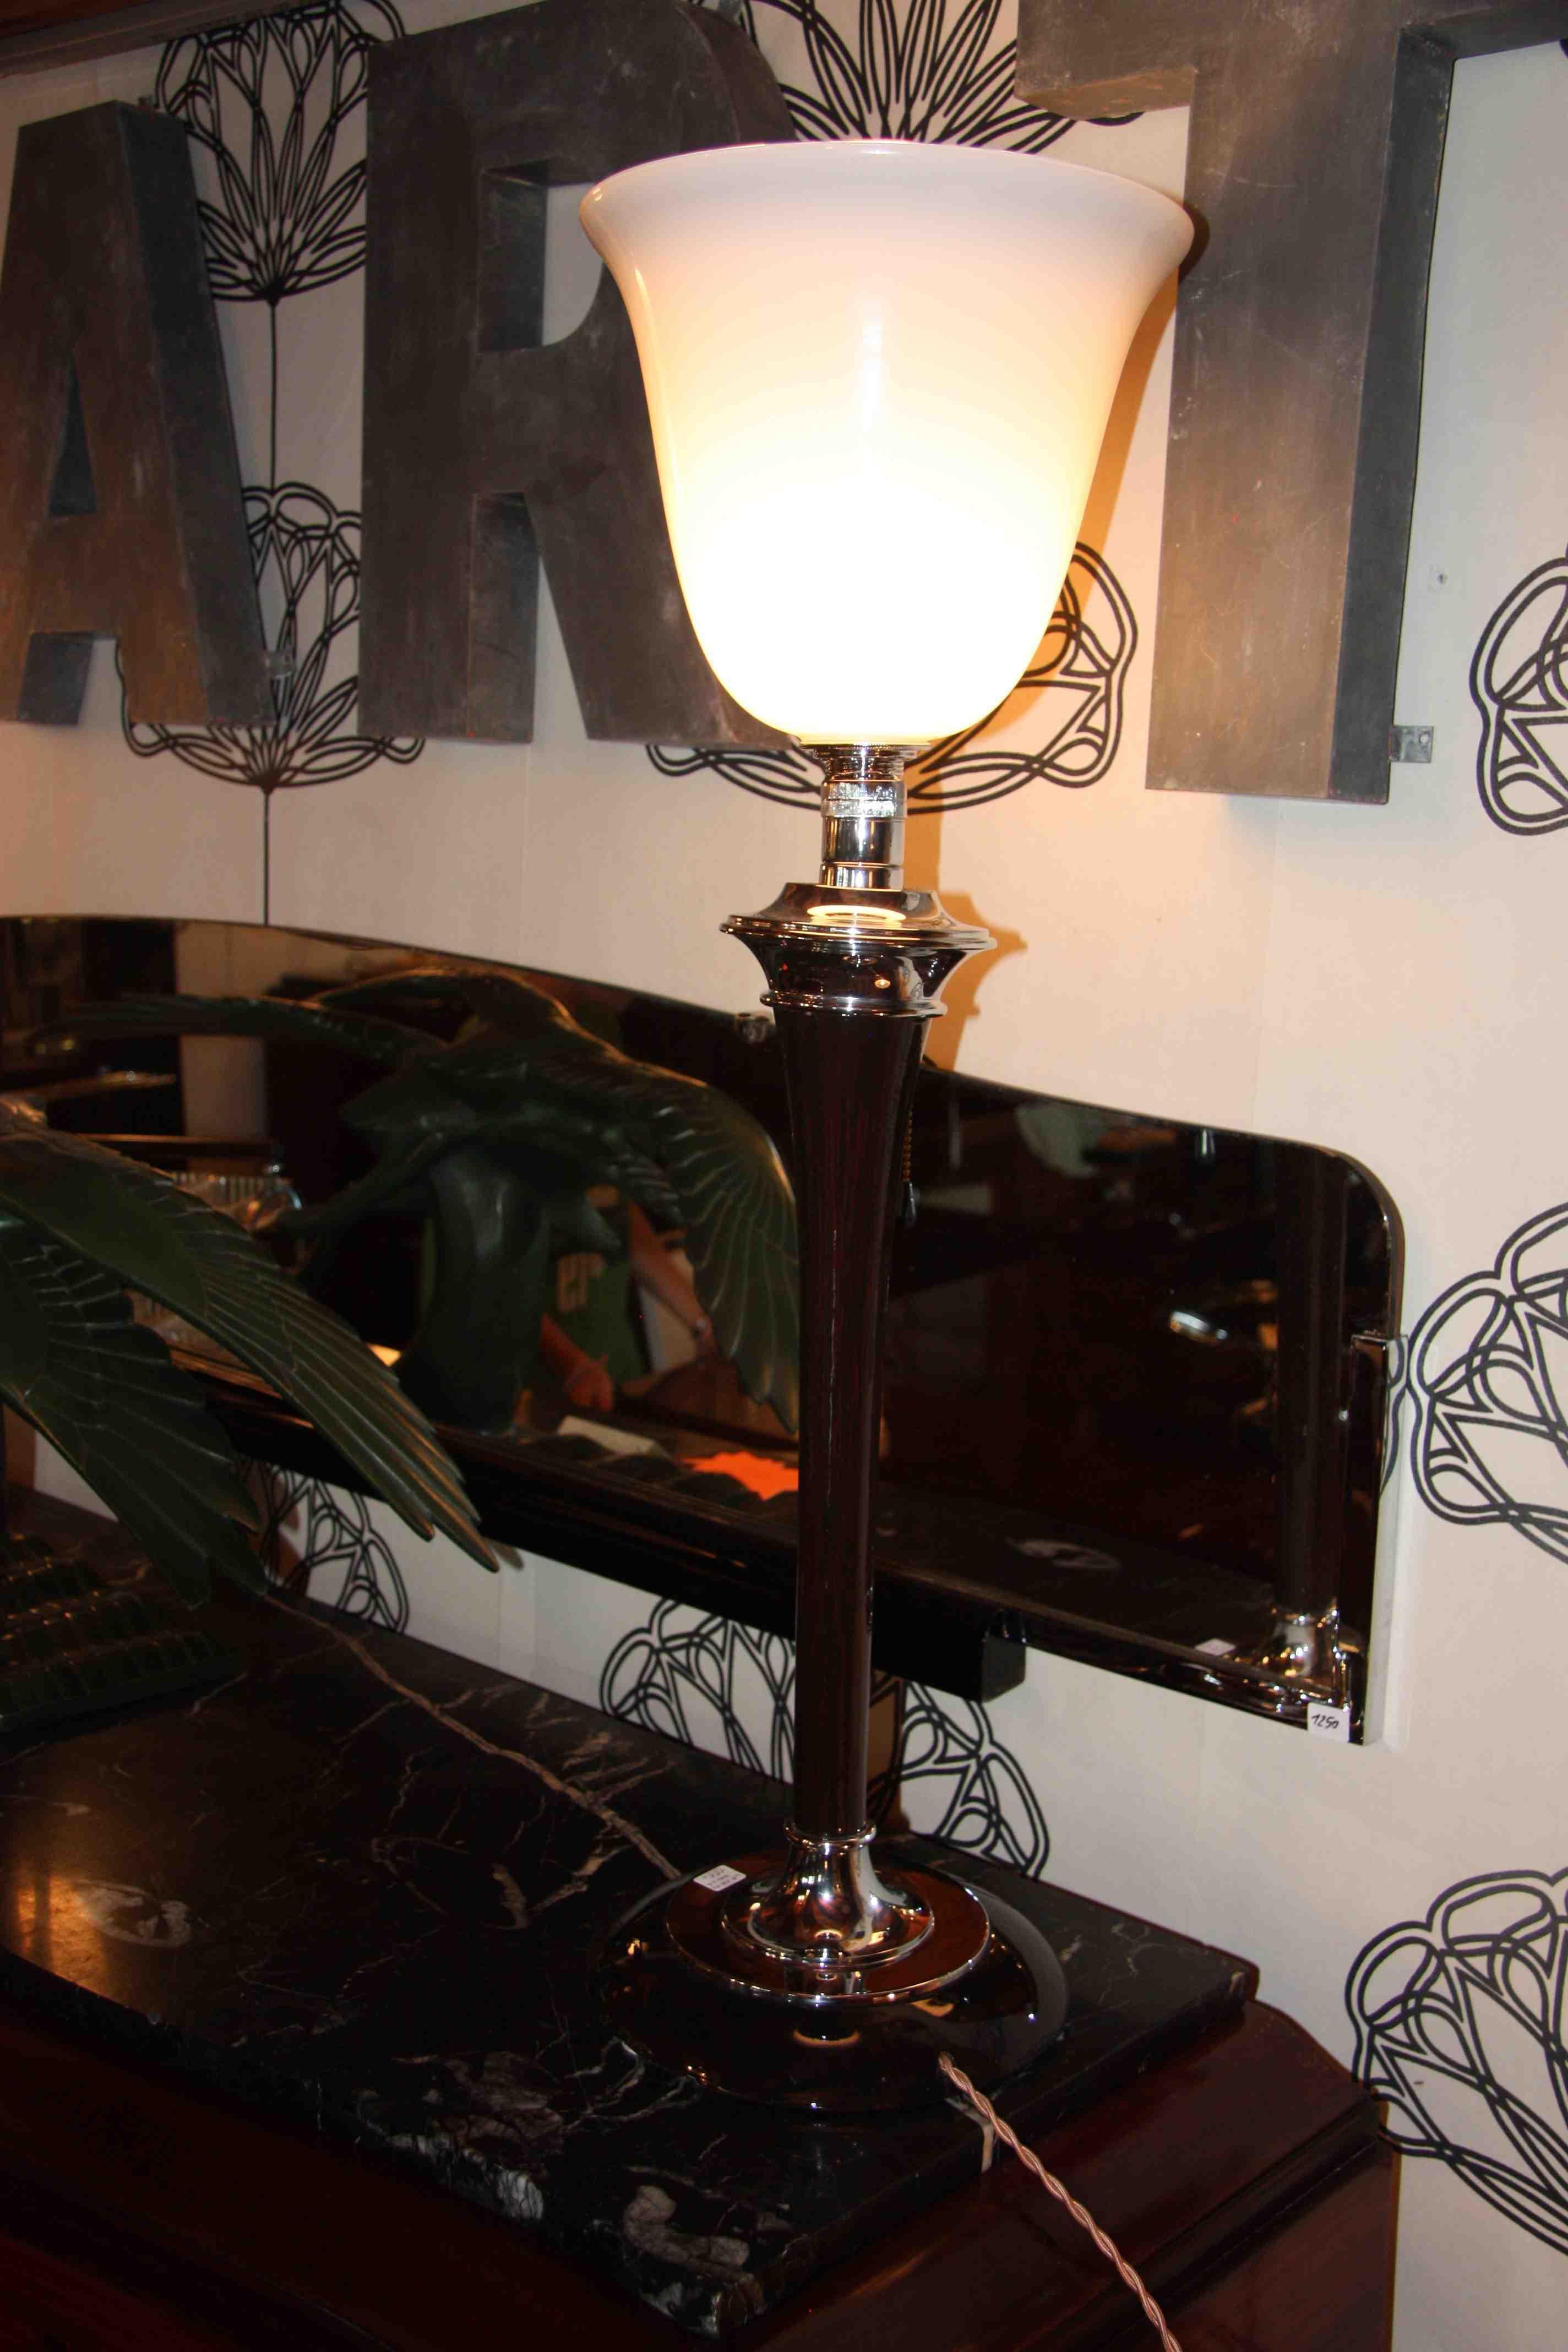 Paire De Lampes Mazda 1930 Premieres Edition Esprit Art Deco Vente